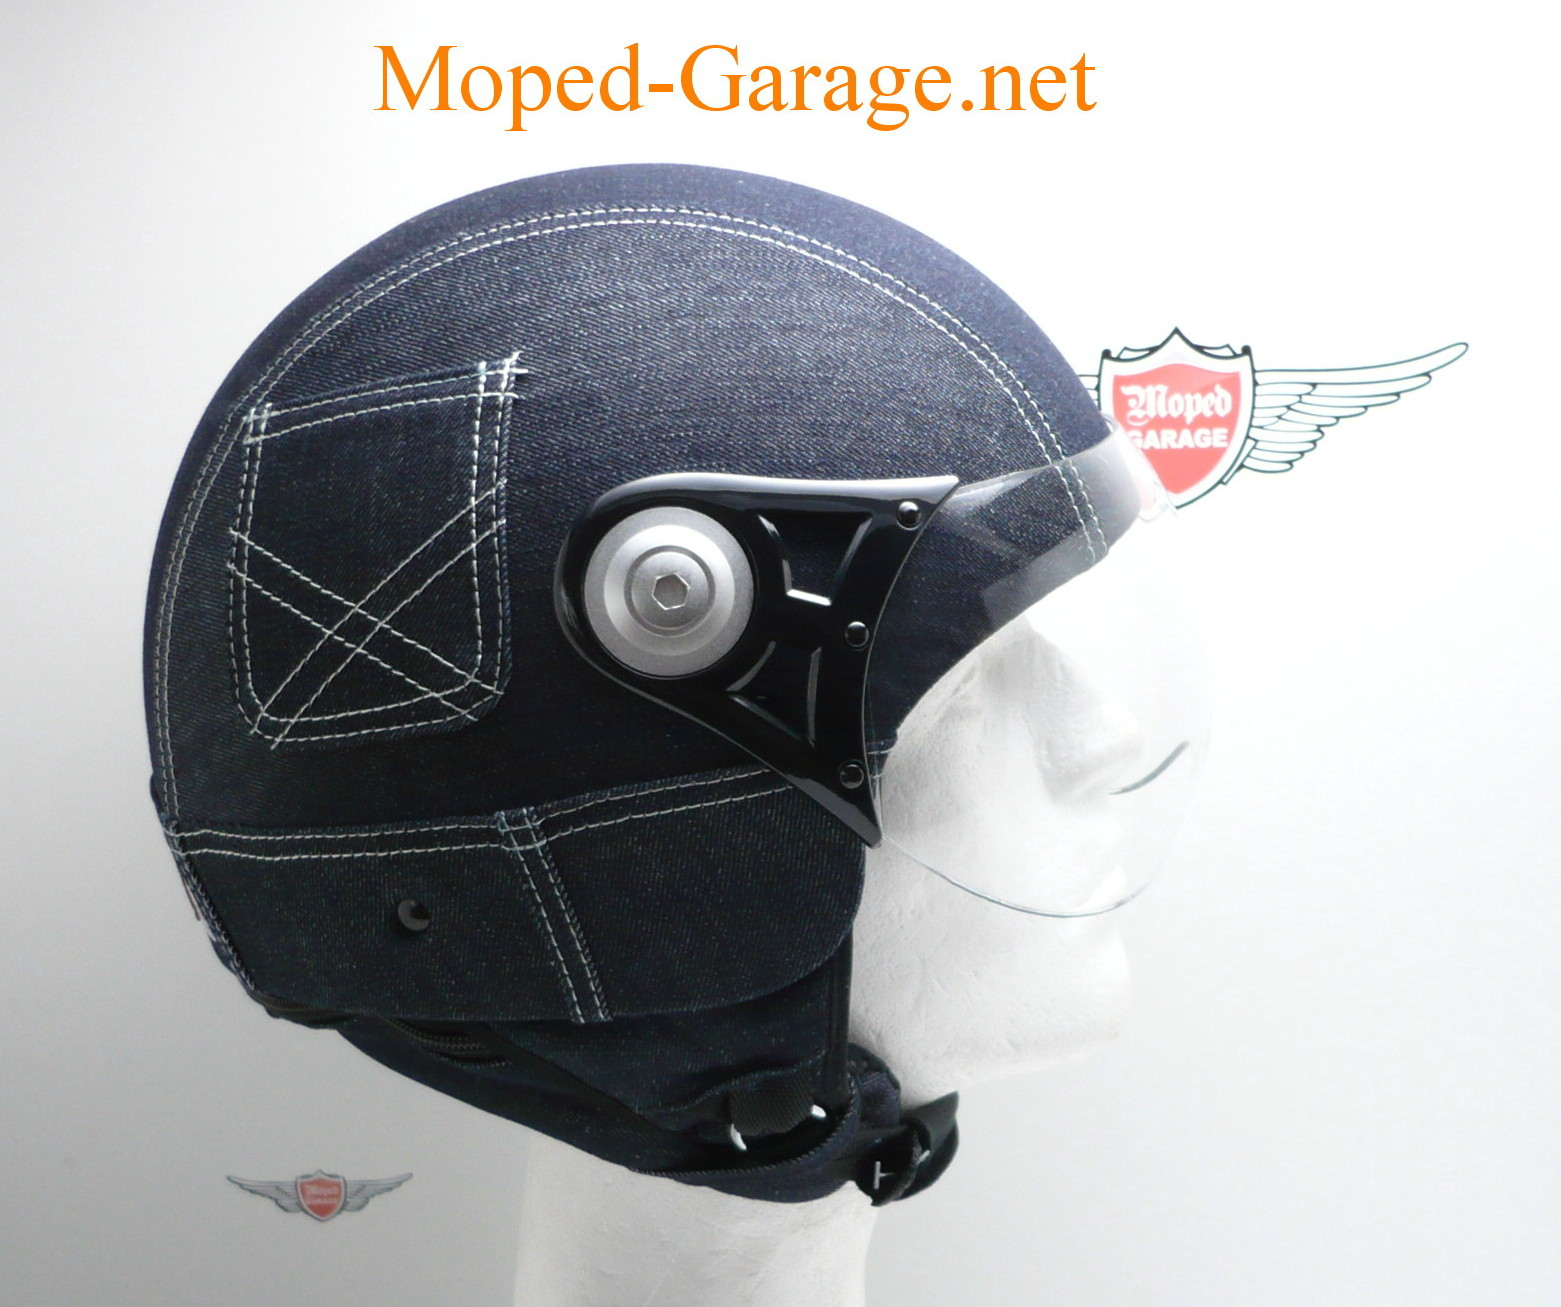 moped motorrad mofa moped roller retro jeans. Black Bedroom Furniture Sets. Home Design Ideas